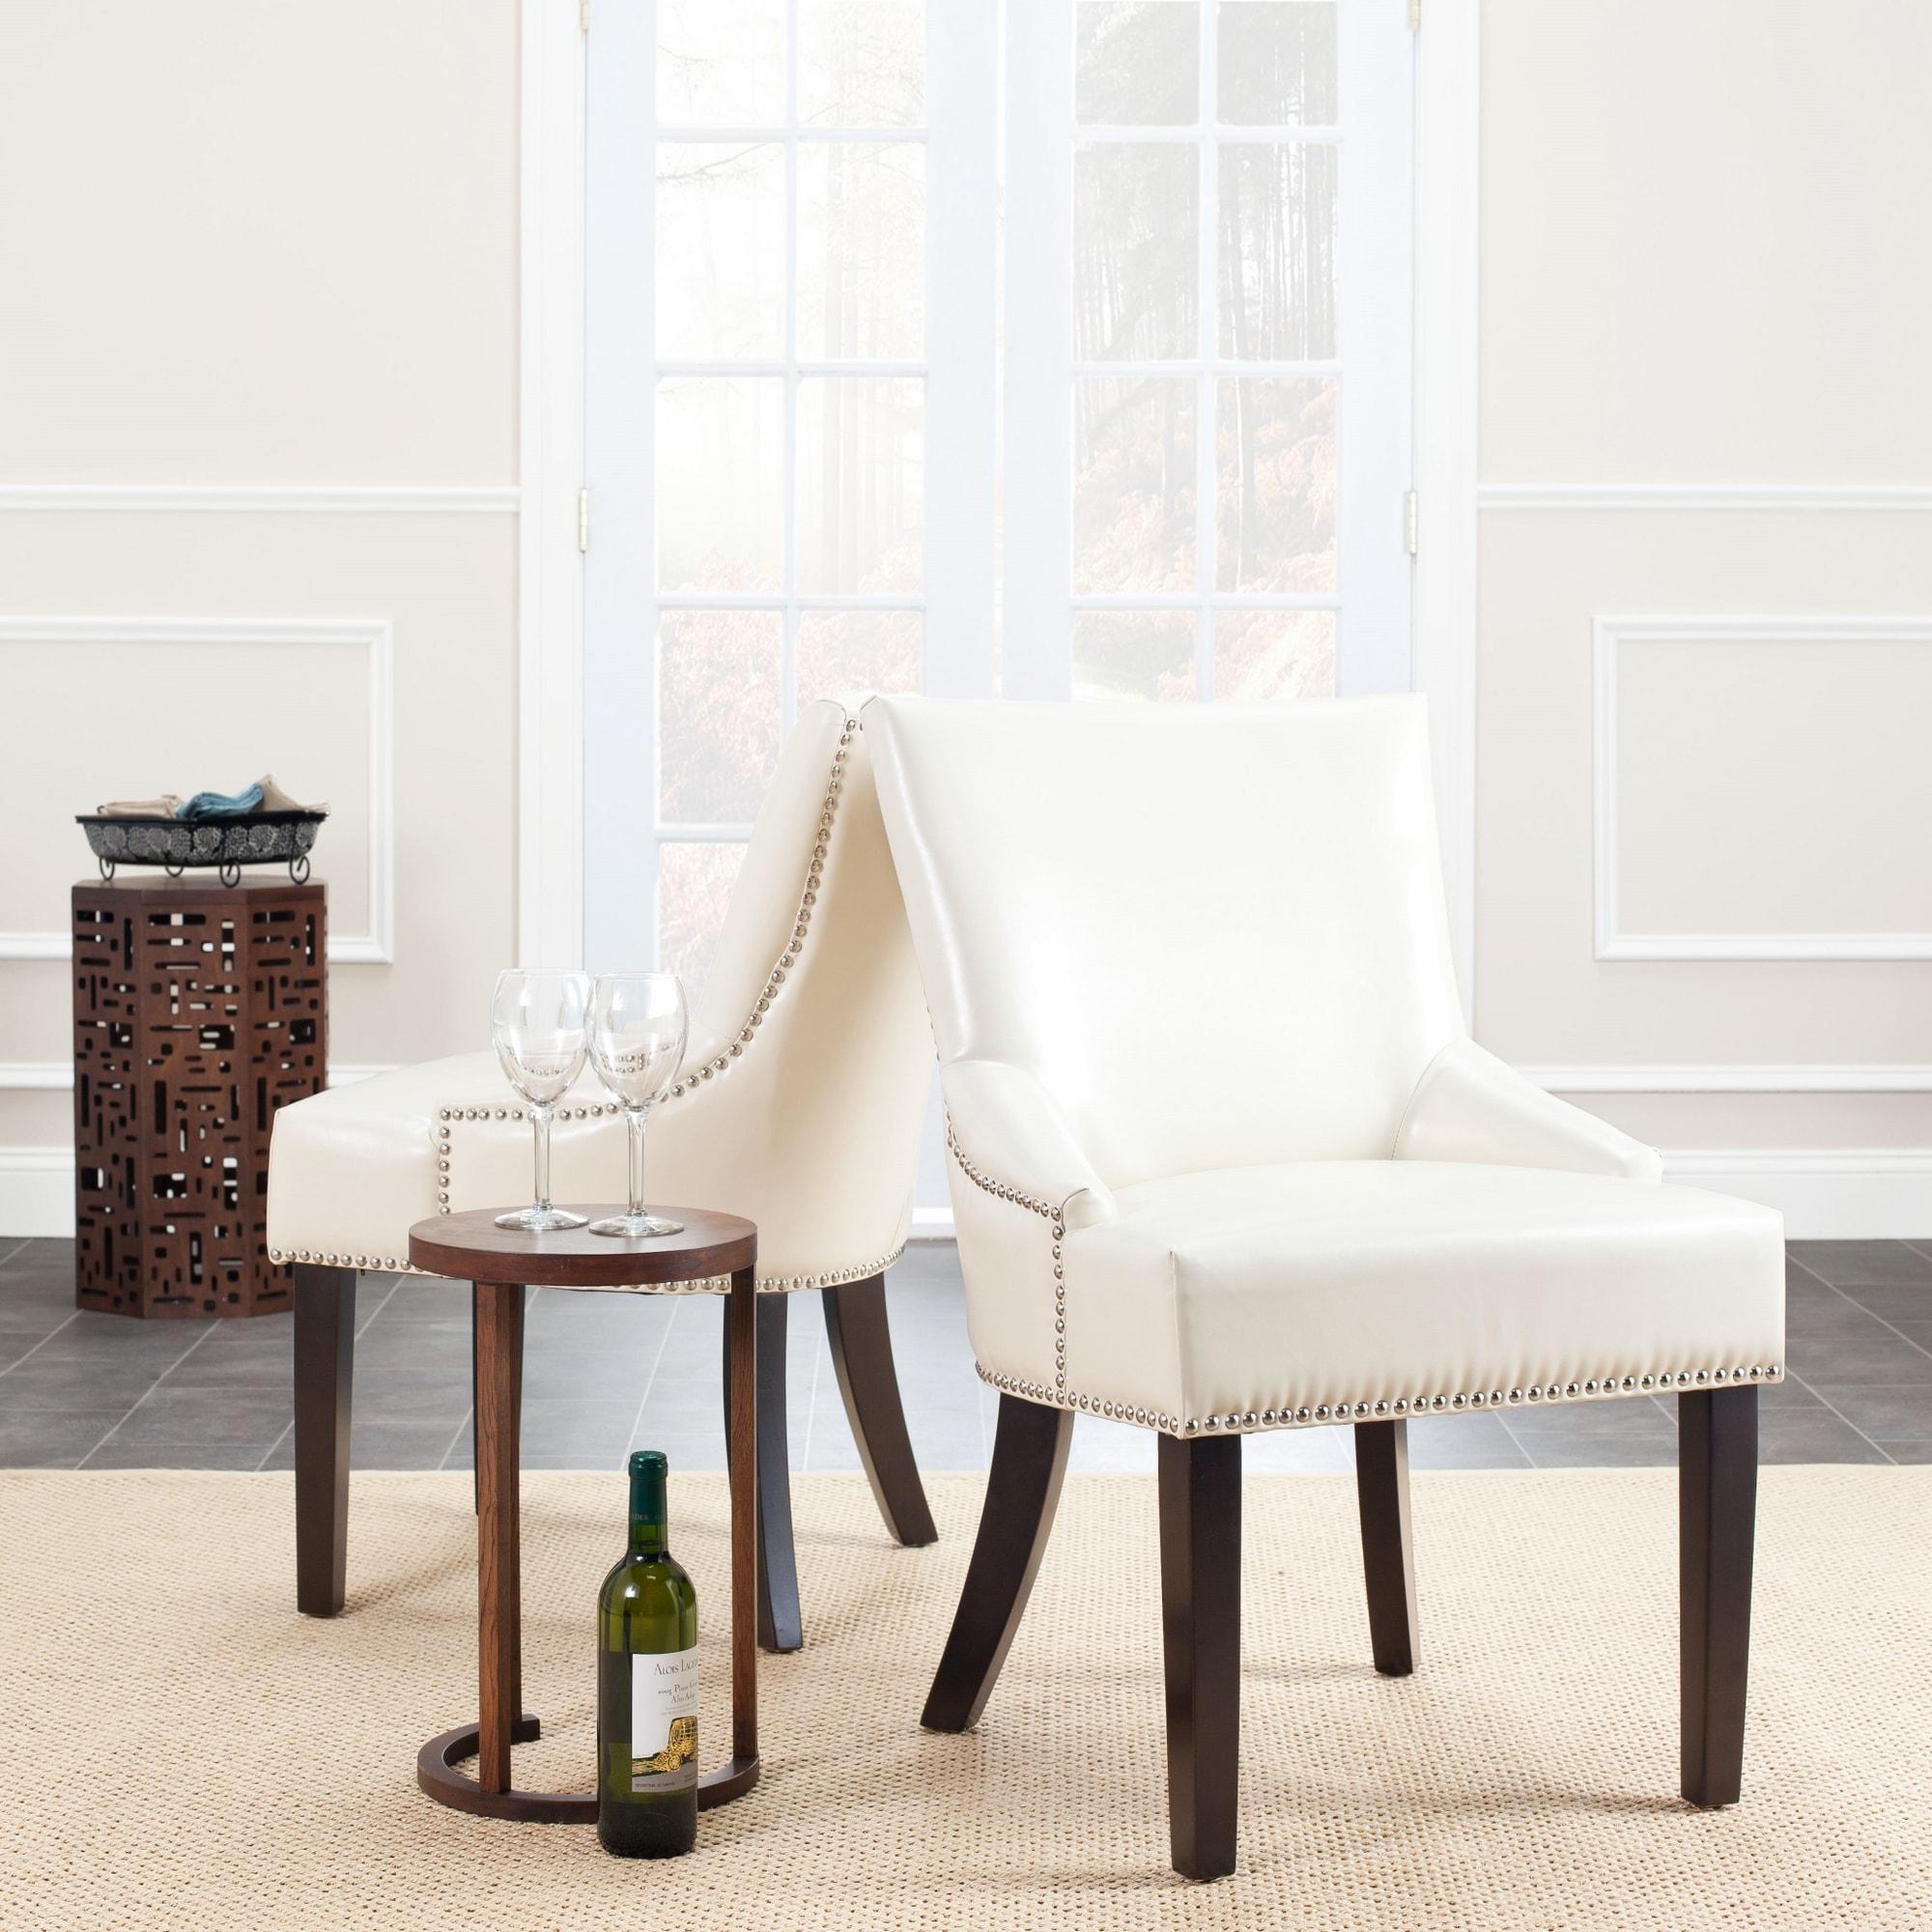 Cream Dining Room Chairs: Safavieh Loire Cream Leather Nailhead Dining Chairs (Set